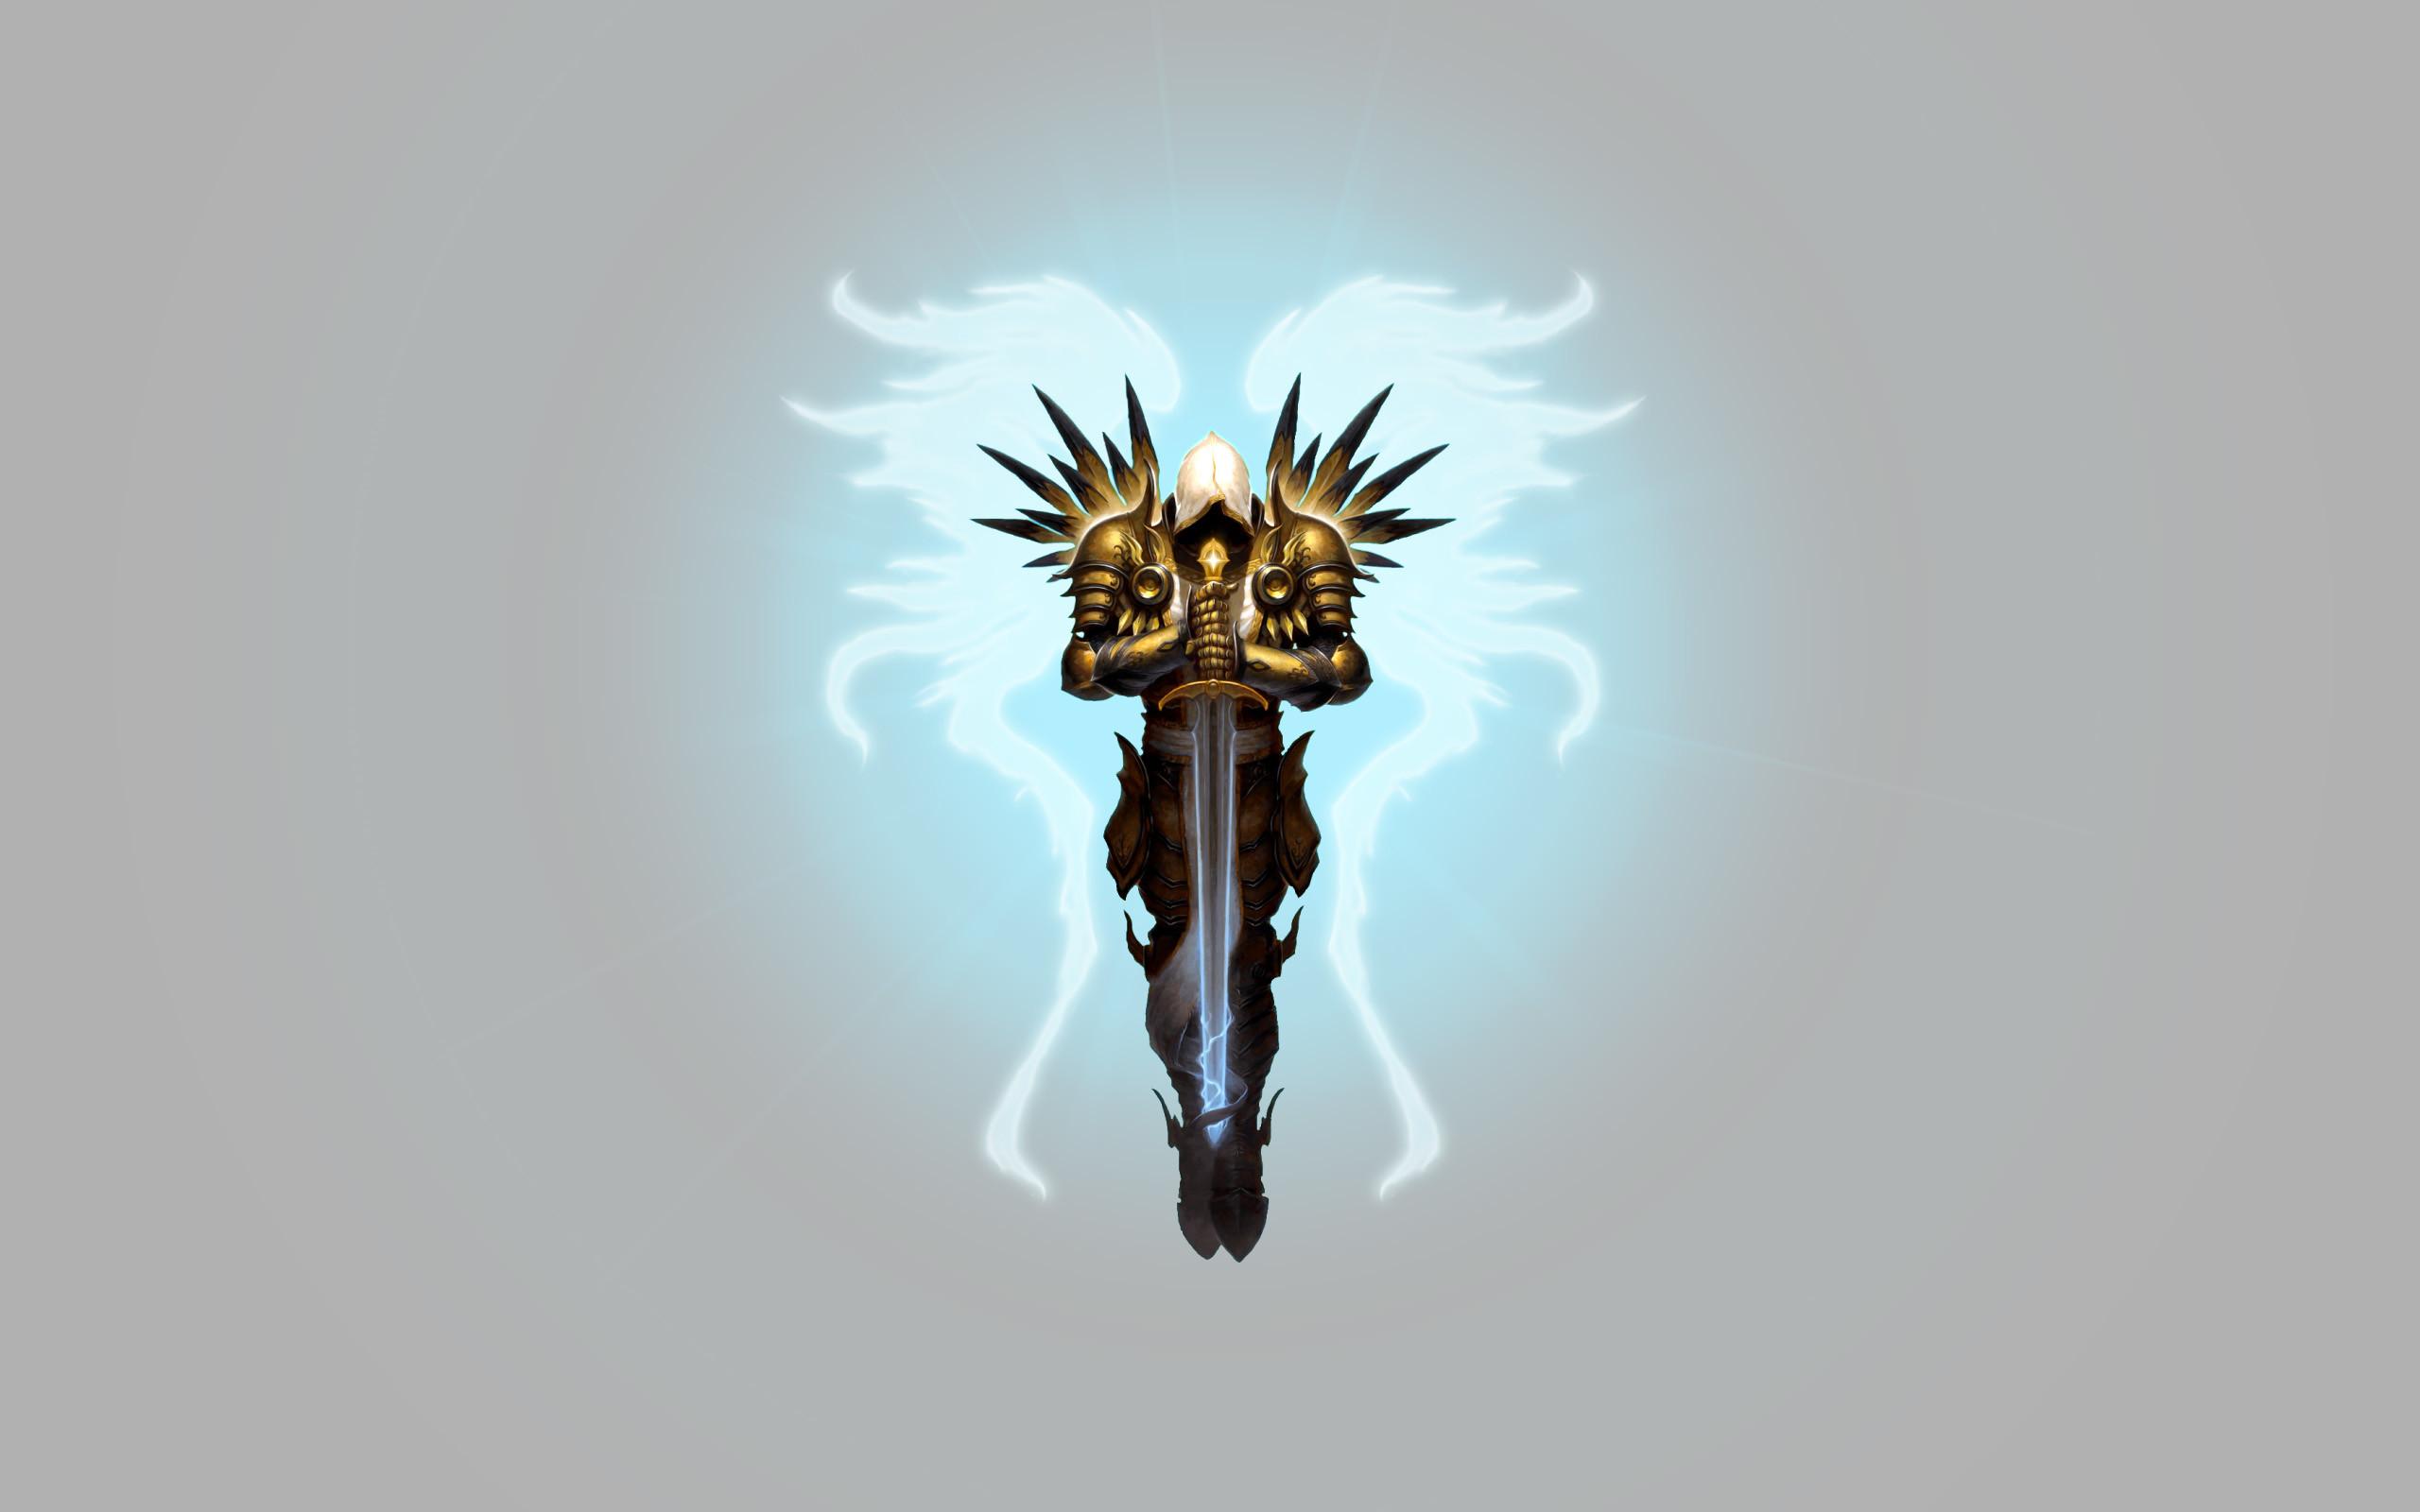 Video Game – Diablo III Tyrael (Diablo III) Wallpaper